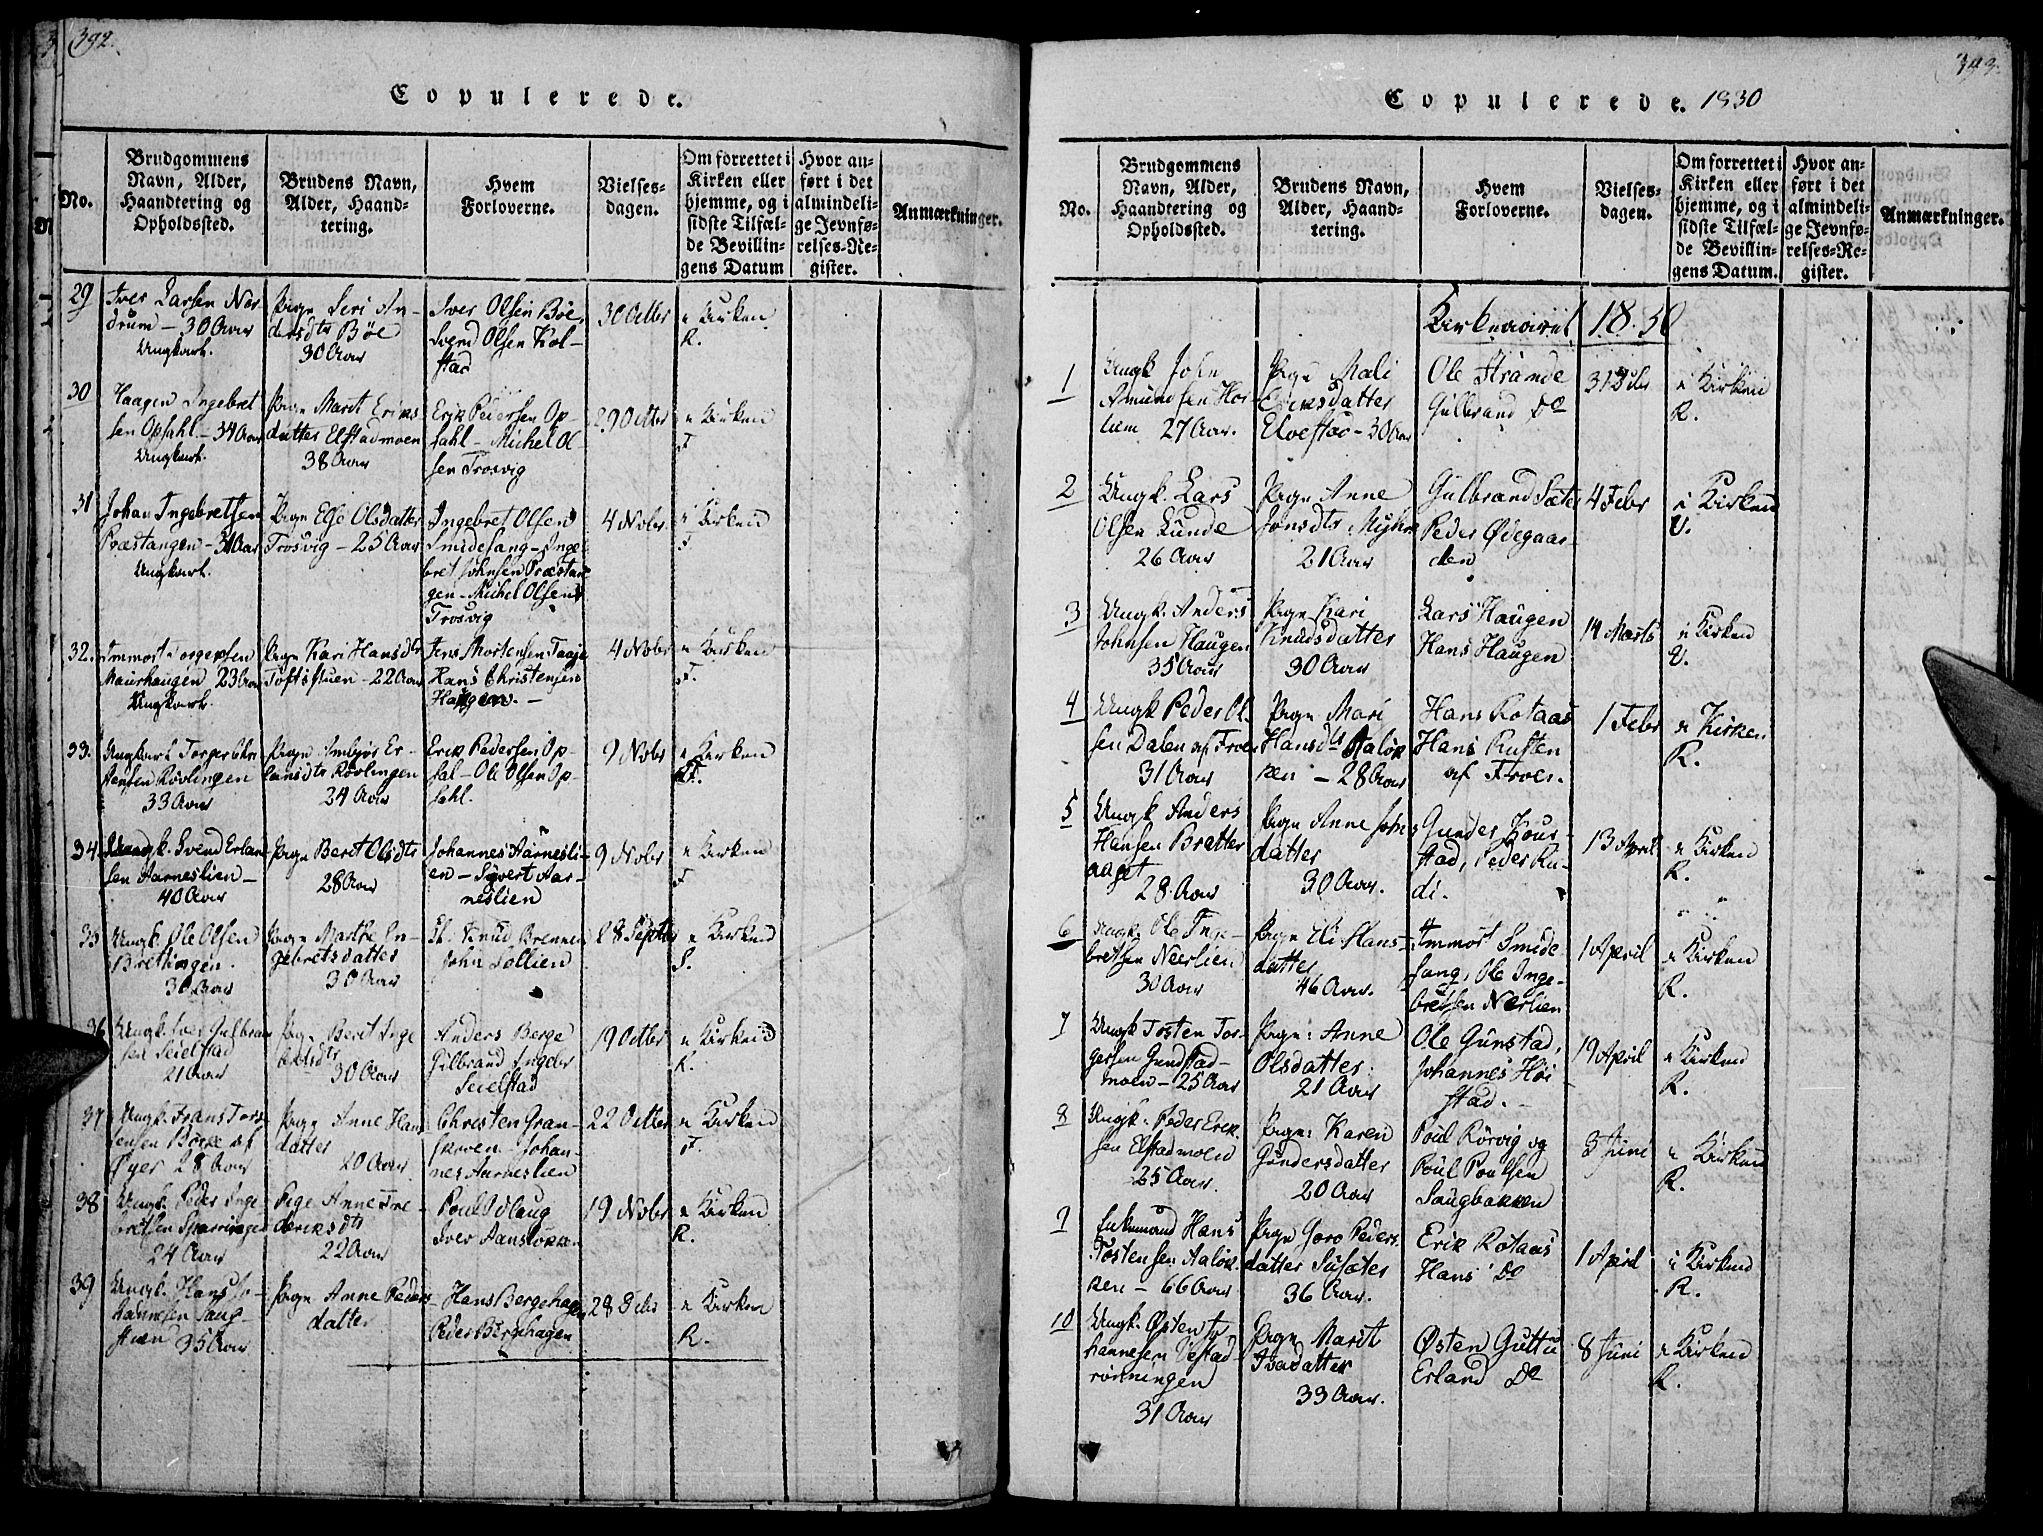 SAH, Ringebu prestekontor, Ministerialbok nr. 4, 1821-1839, s. 392-393